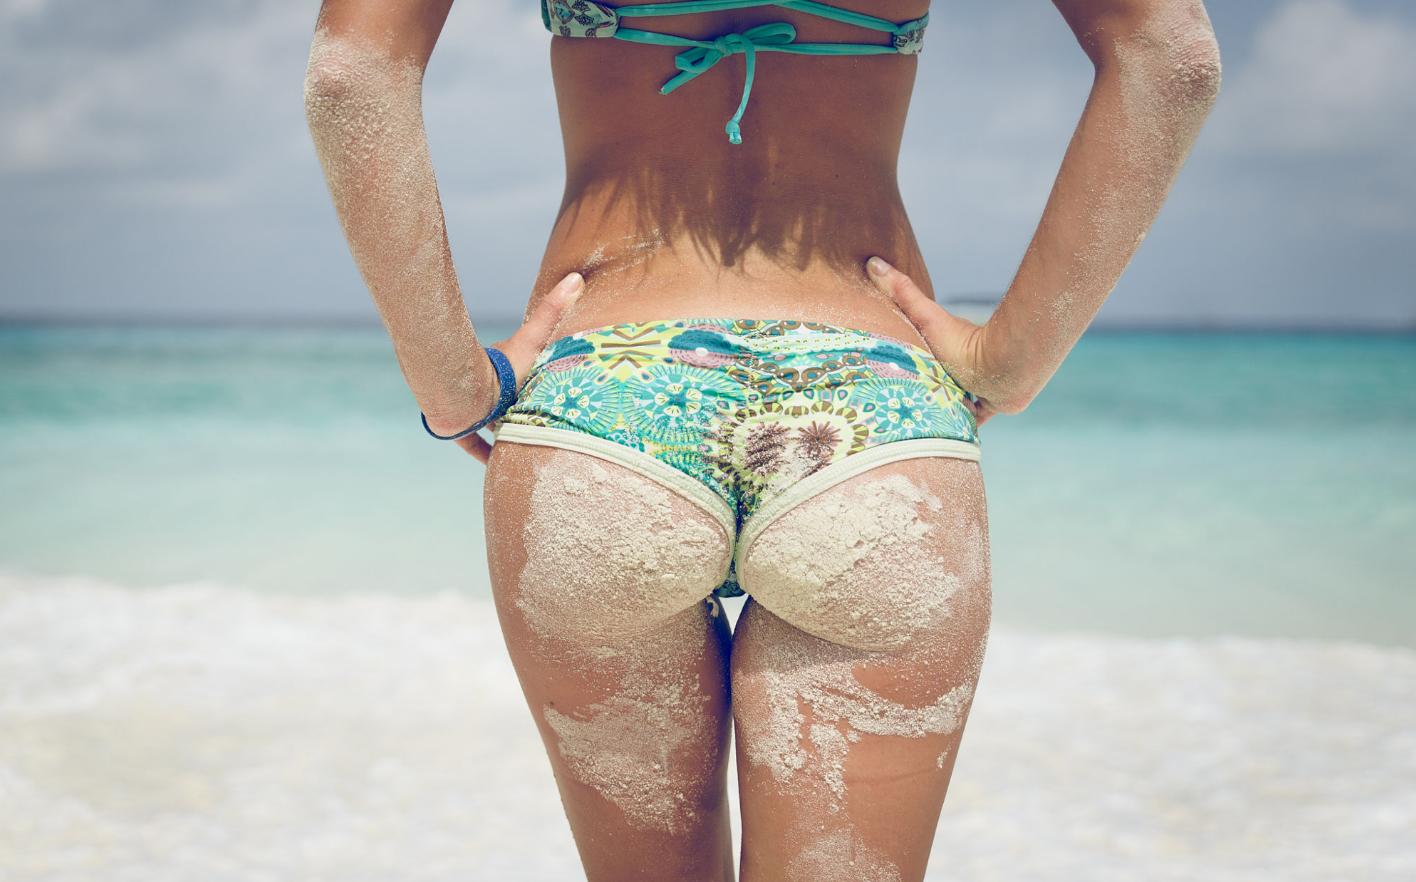 People 1416x882 women bikini summer ass hot spring sand covered the gap sea hands on hips back women outdoors